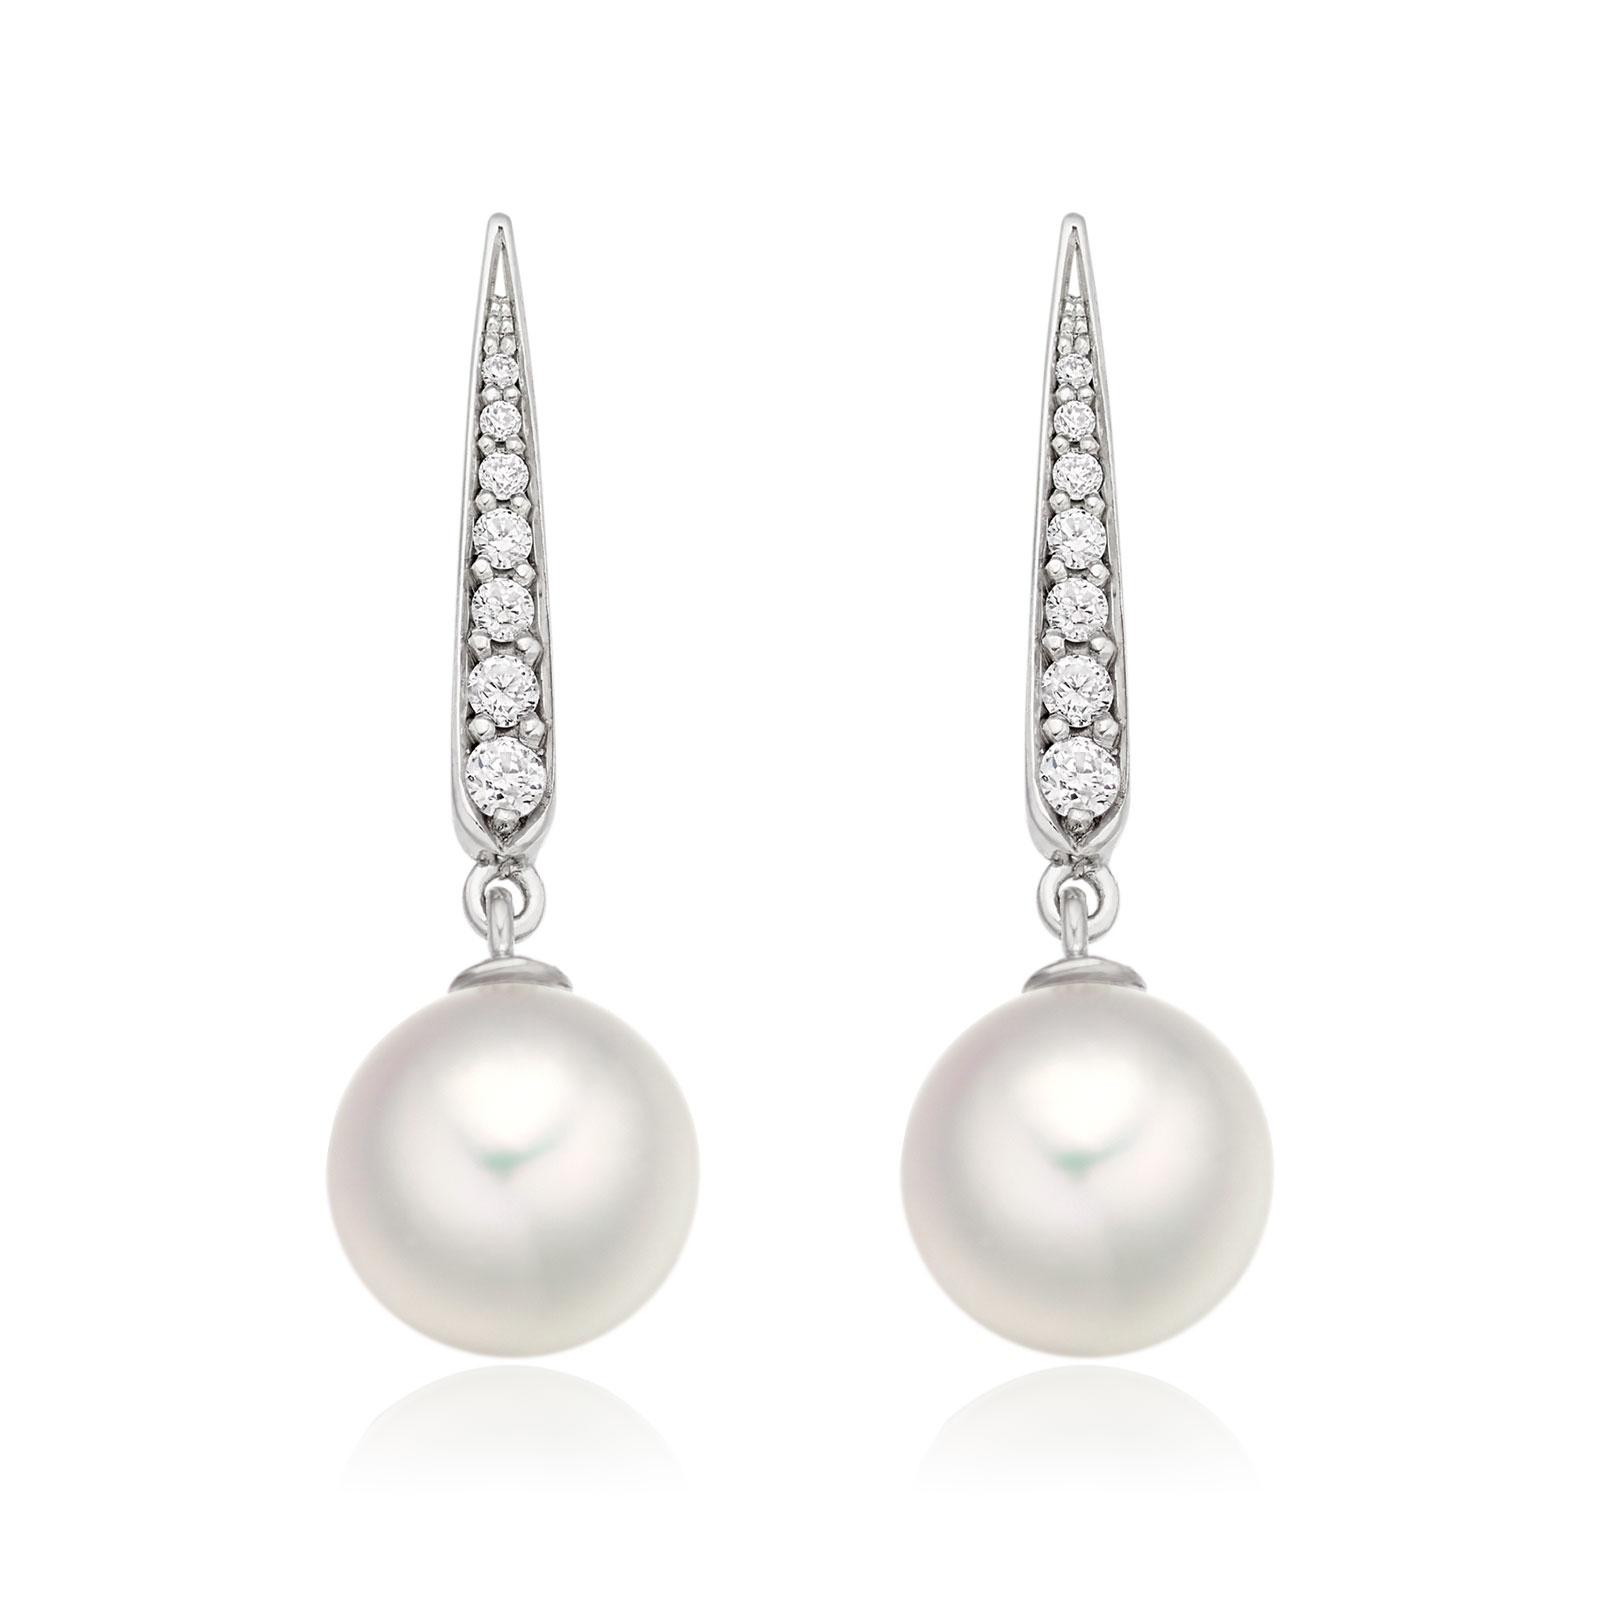 Mythologie Dewdrop Akoya Pearl Earrings in White Gold-AEWRWG1213-1